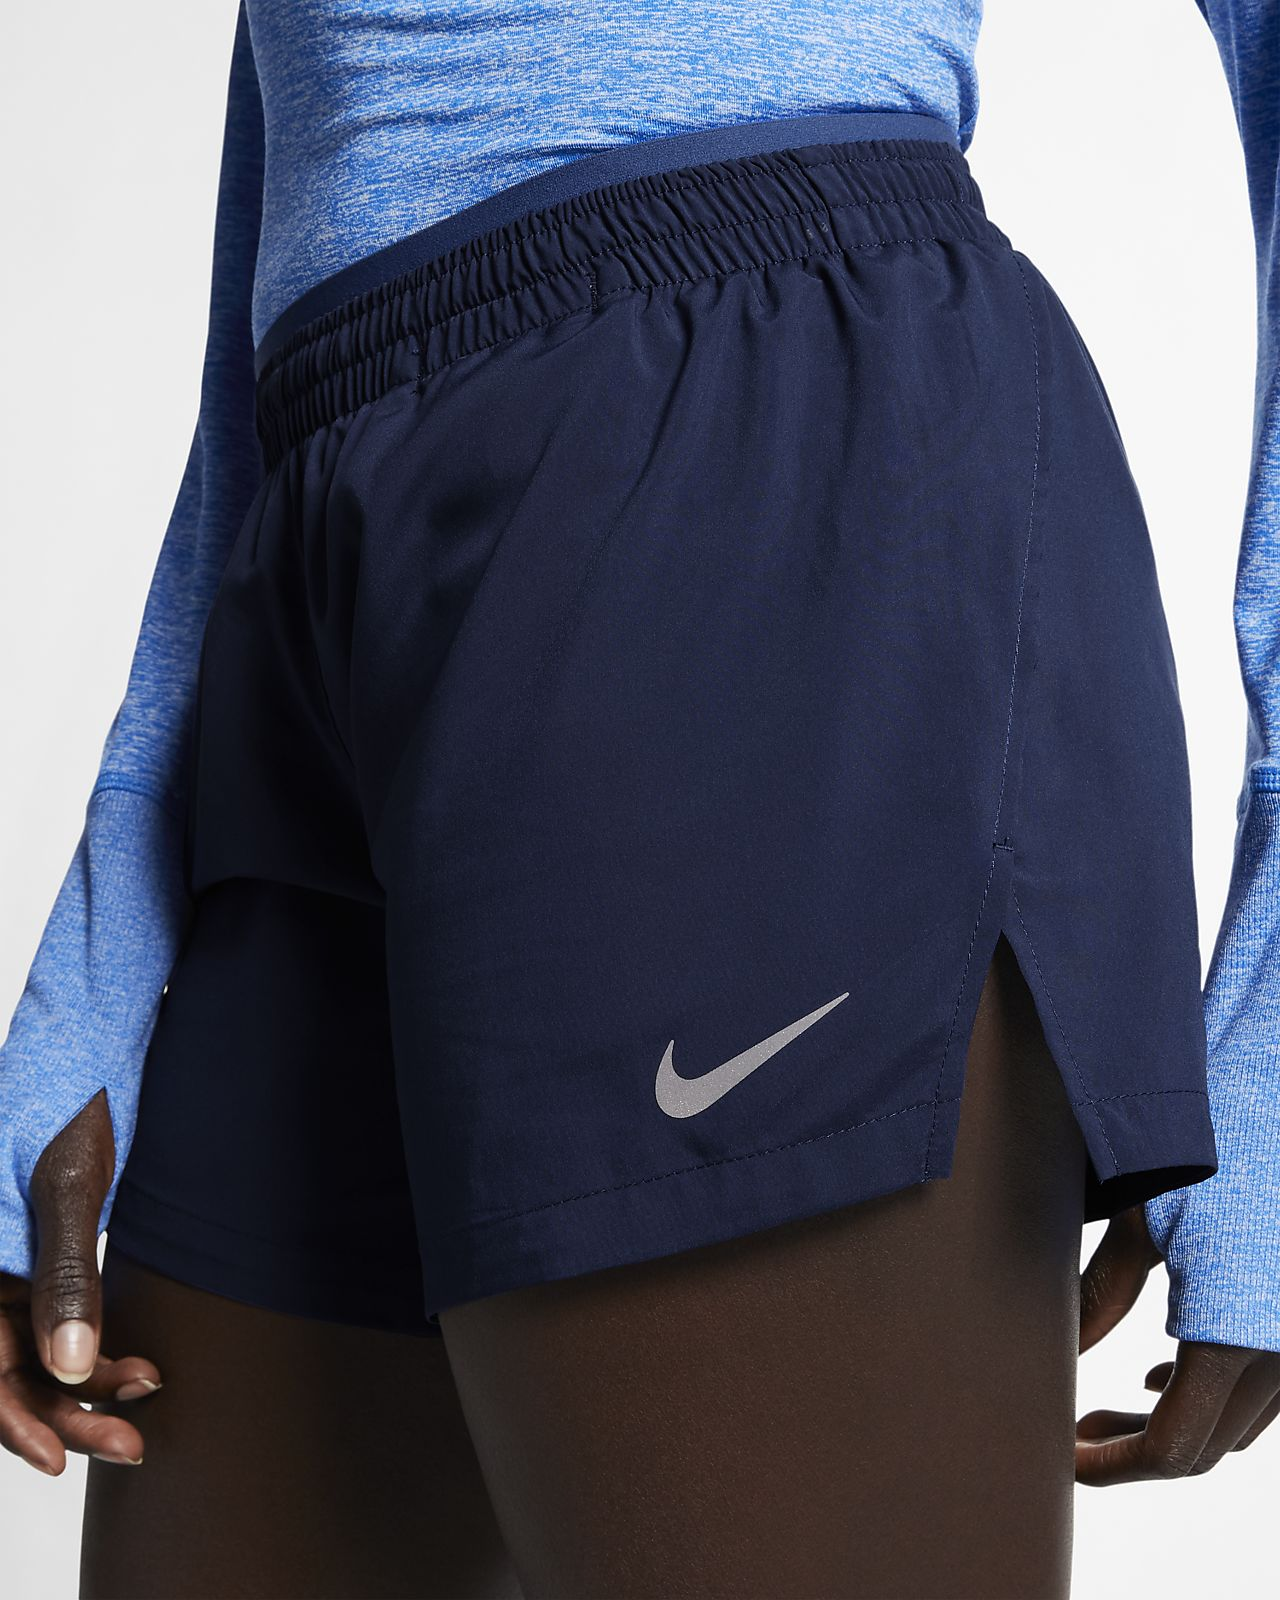 Nike Elevate løpeshorts for dame (12,5 cm)